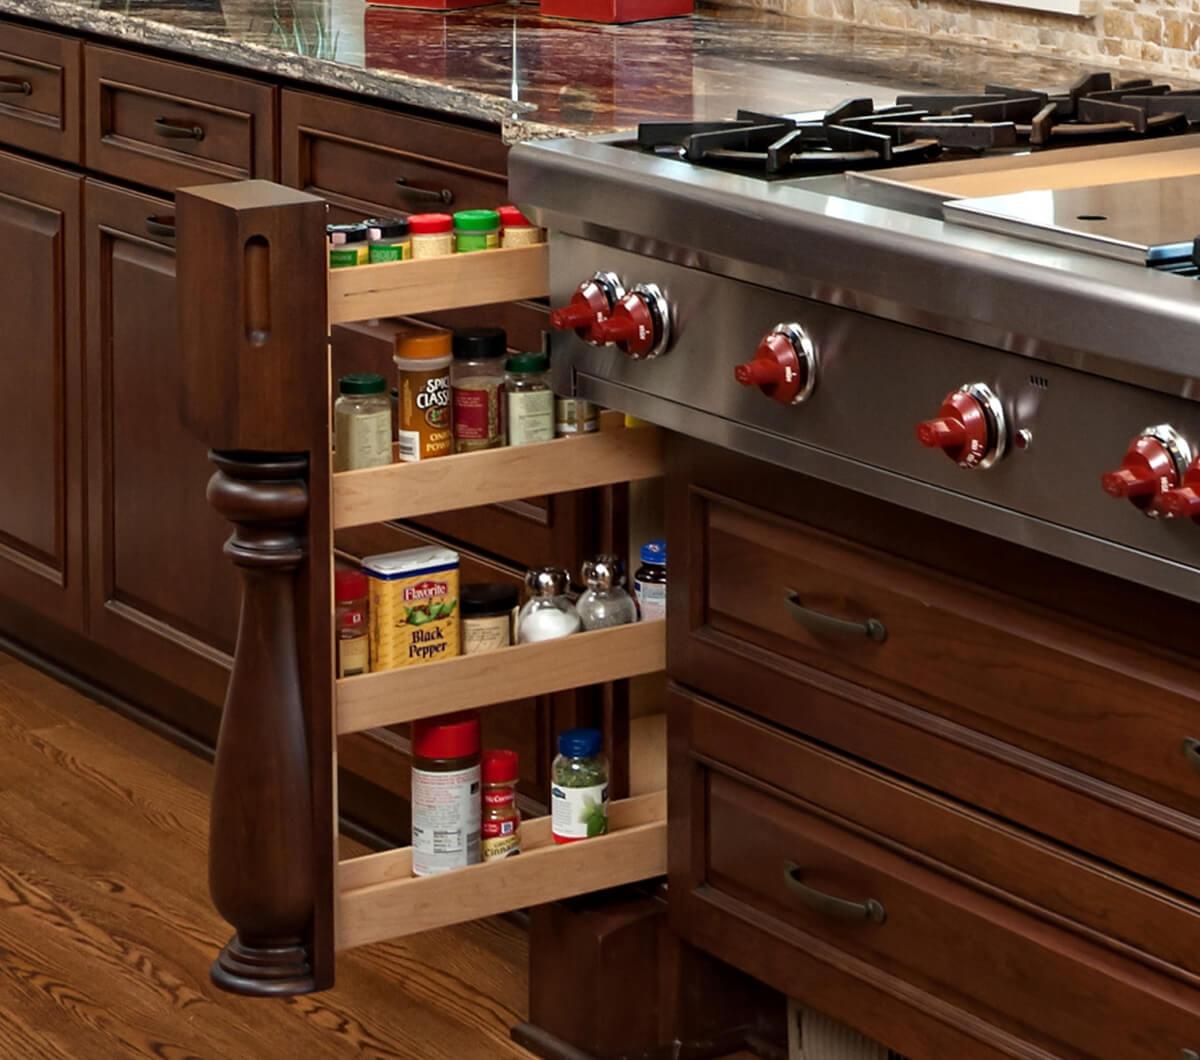 Dura Supreme Cabinetry design by Kristen Peck of Knight Construction Design, Inc.